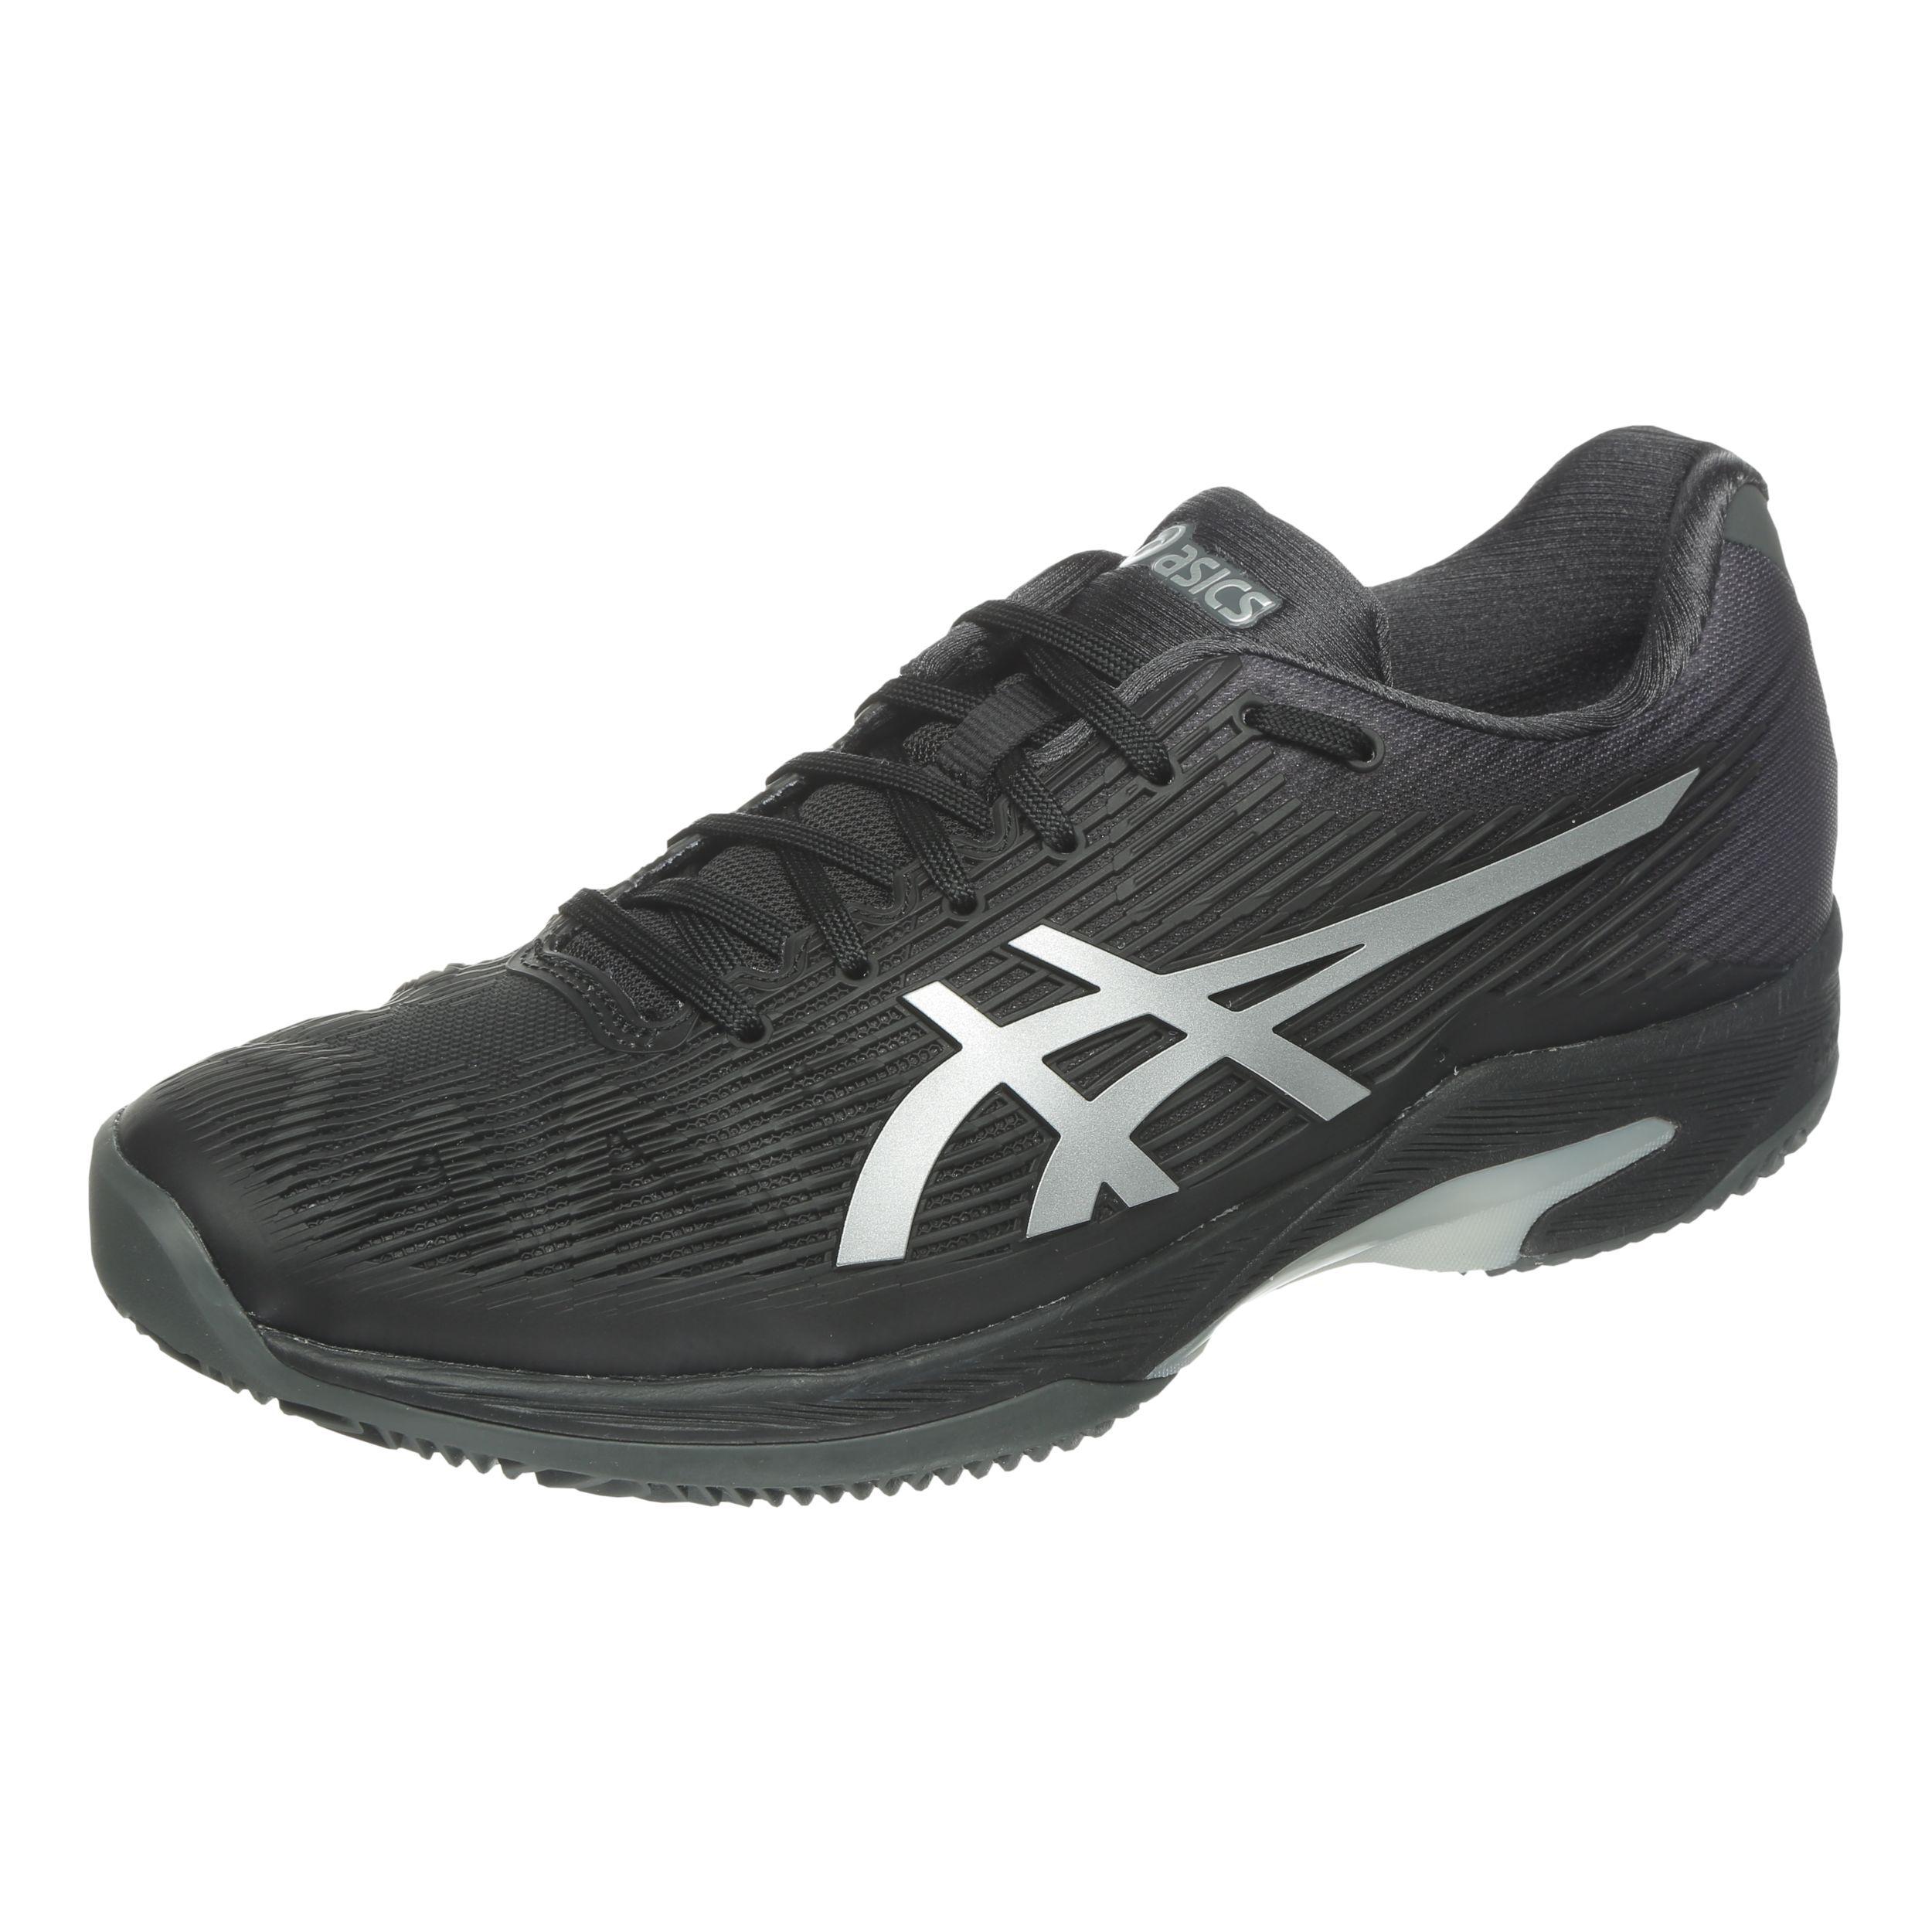 chaussures tennis asics homme terre battue